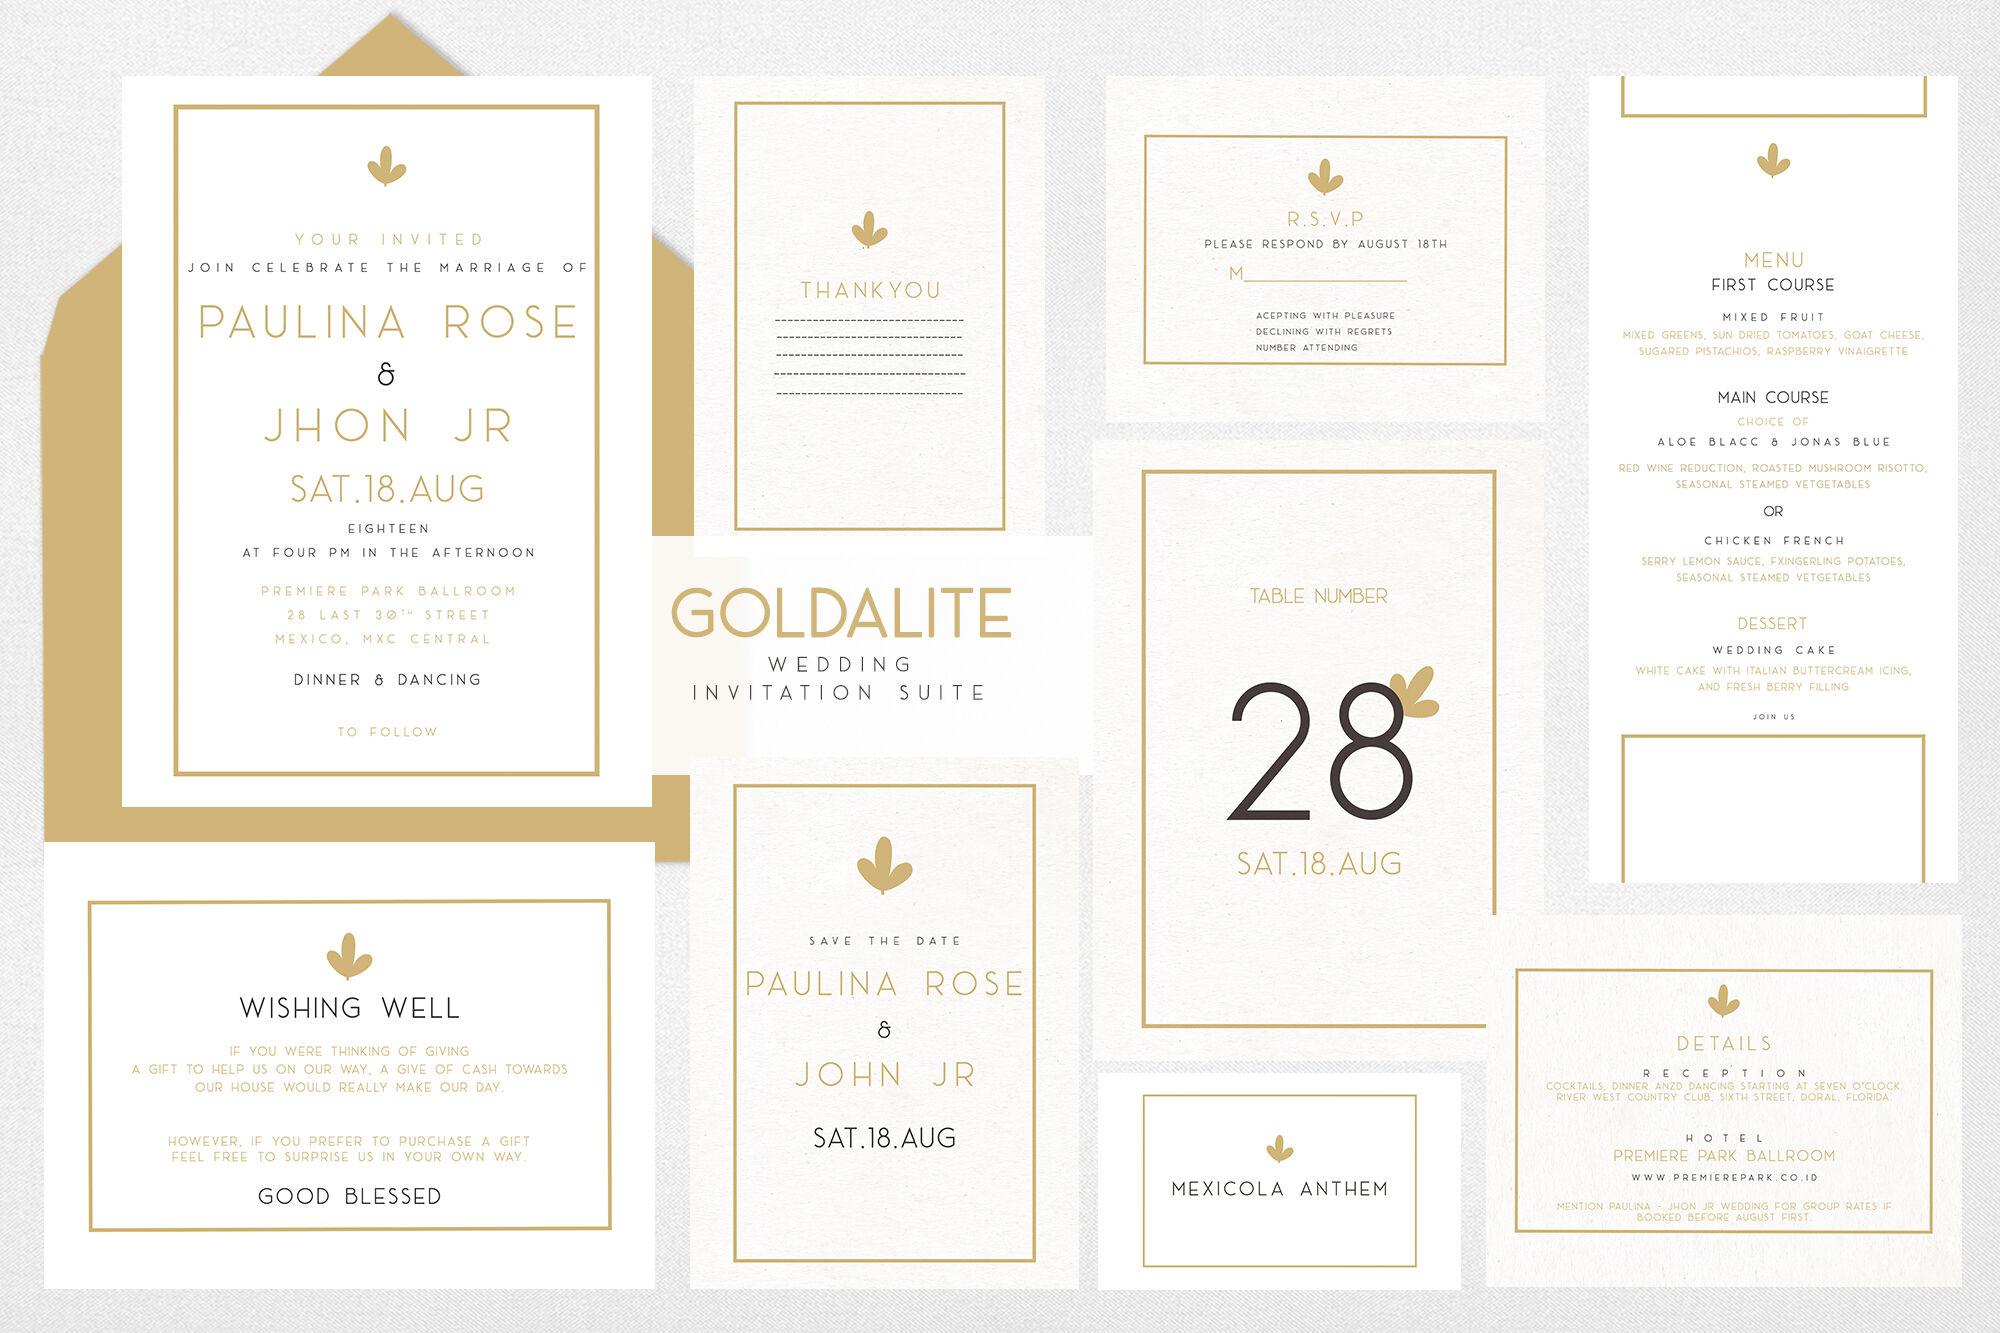 Goldalite Premium Wedding Invitation By Vavadharahap